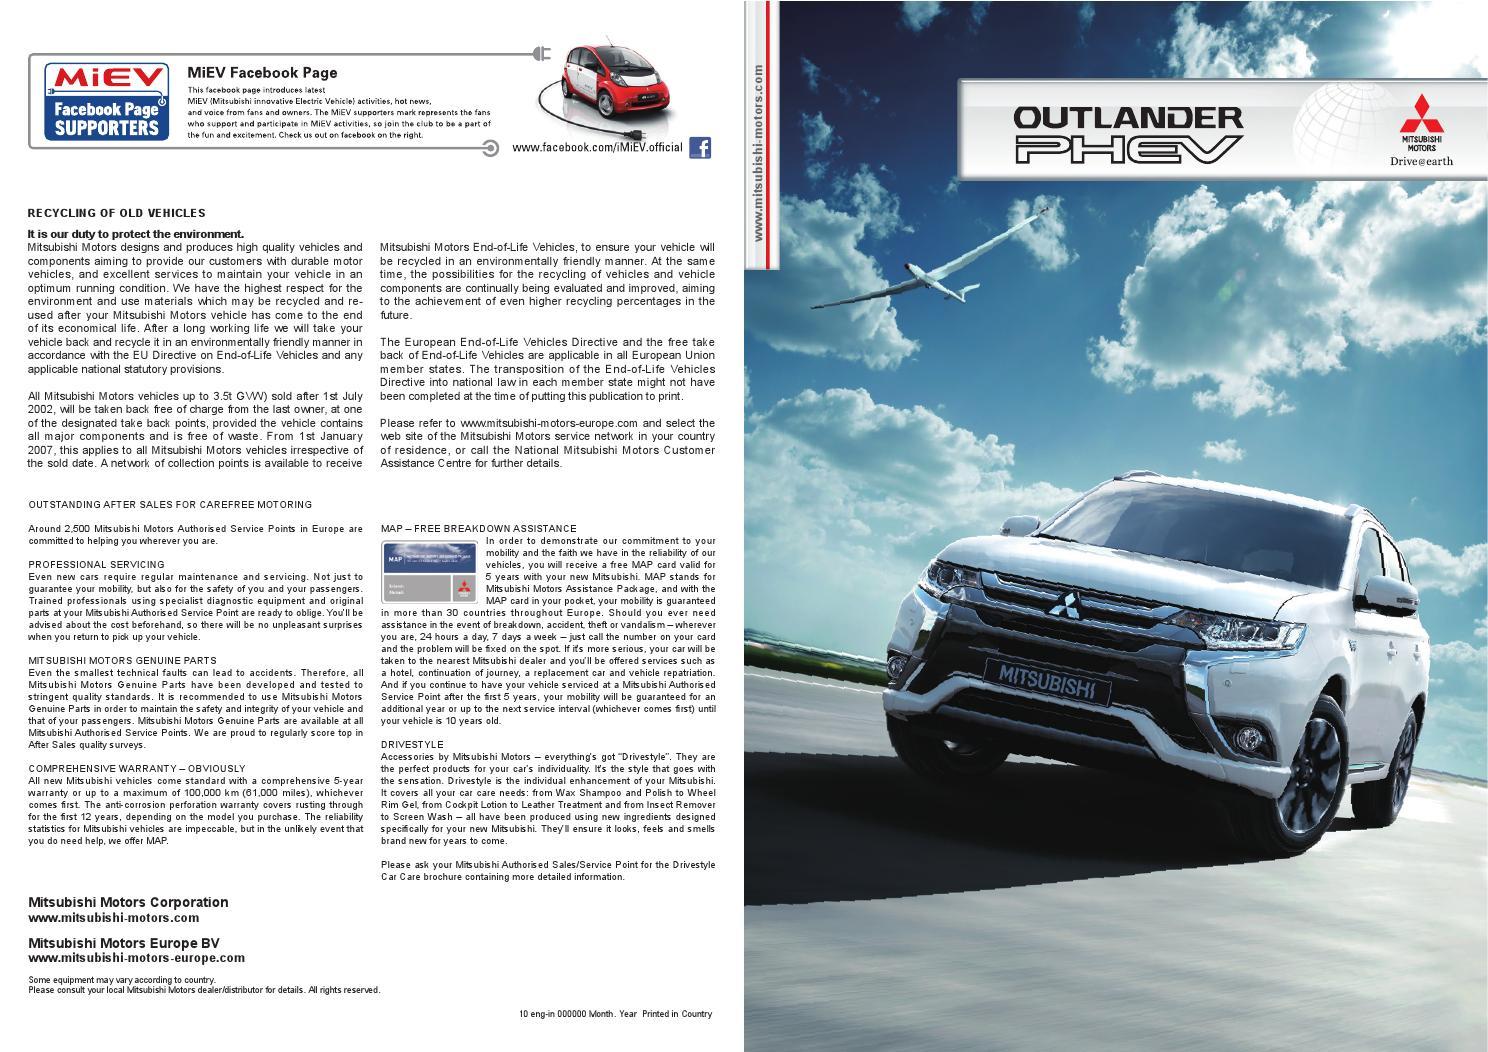 2016 Mitsubishi Outlander PHEV - Europe Brochure - Bob Smith